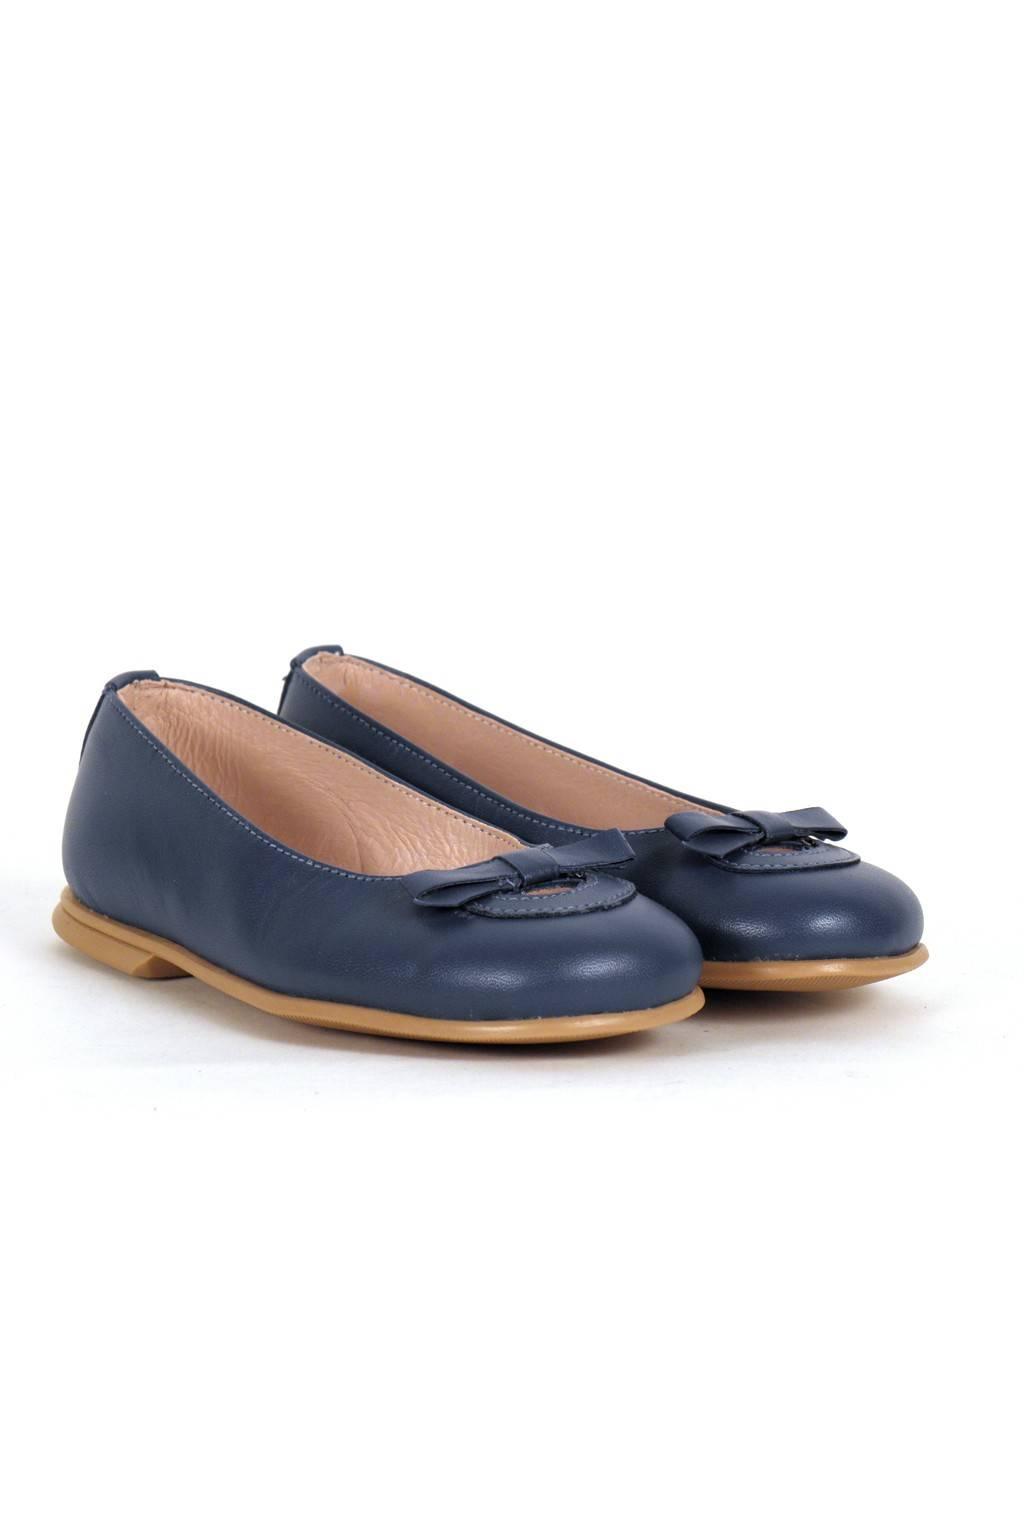 Zapato piel infantil